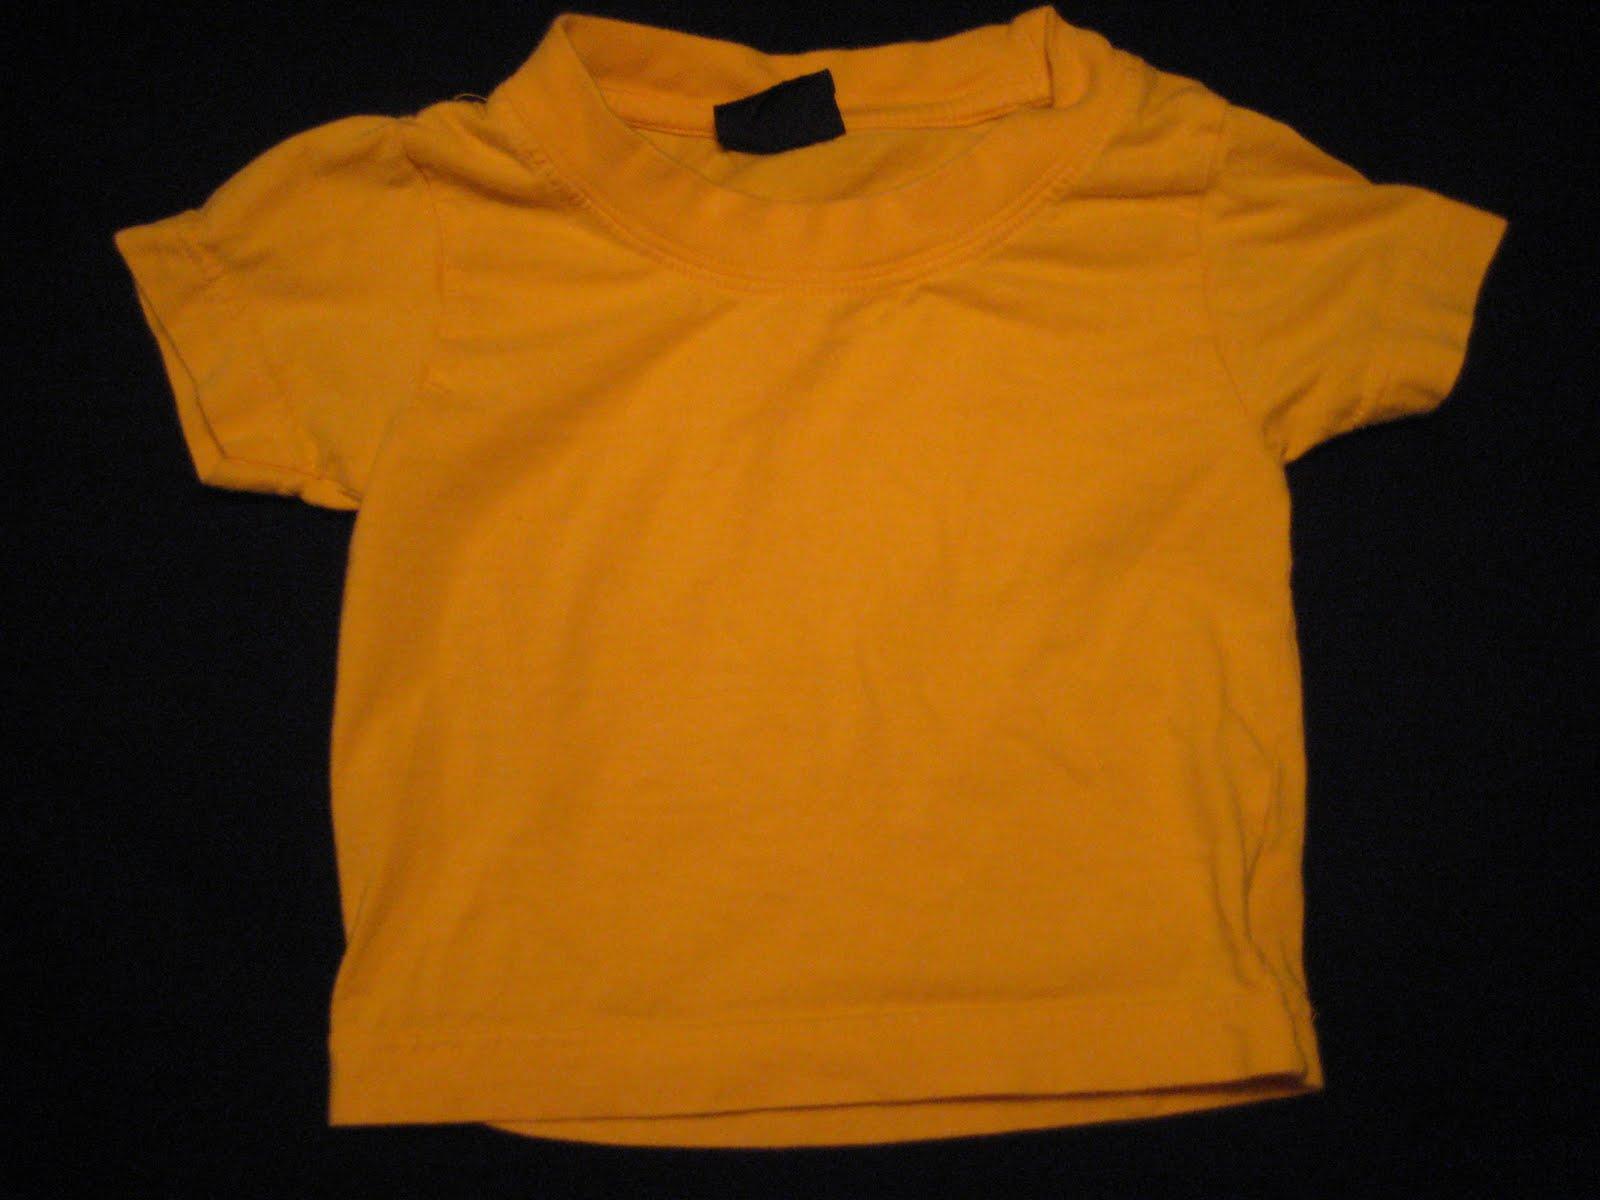 bd84fac2 Gul t-shirt i storlek 60